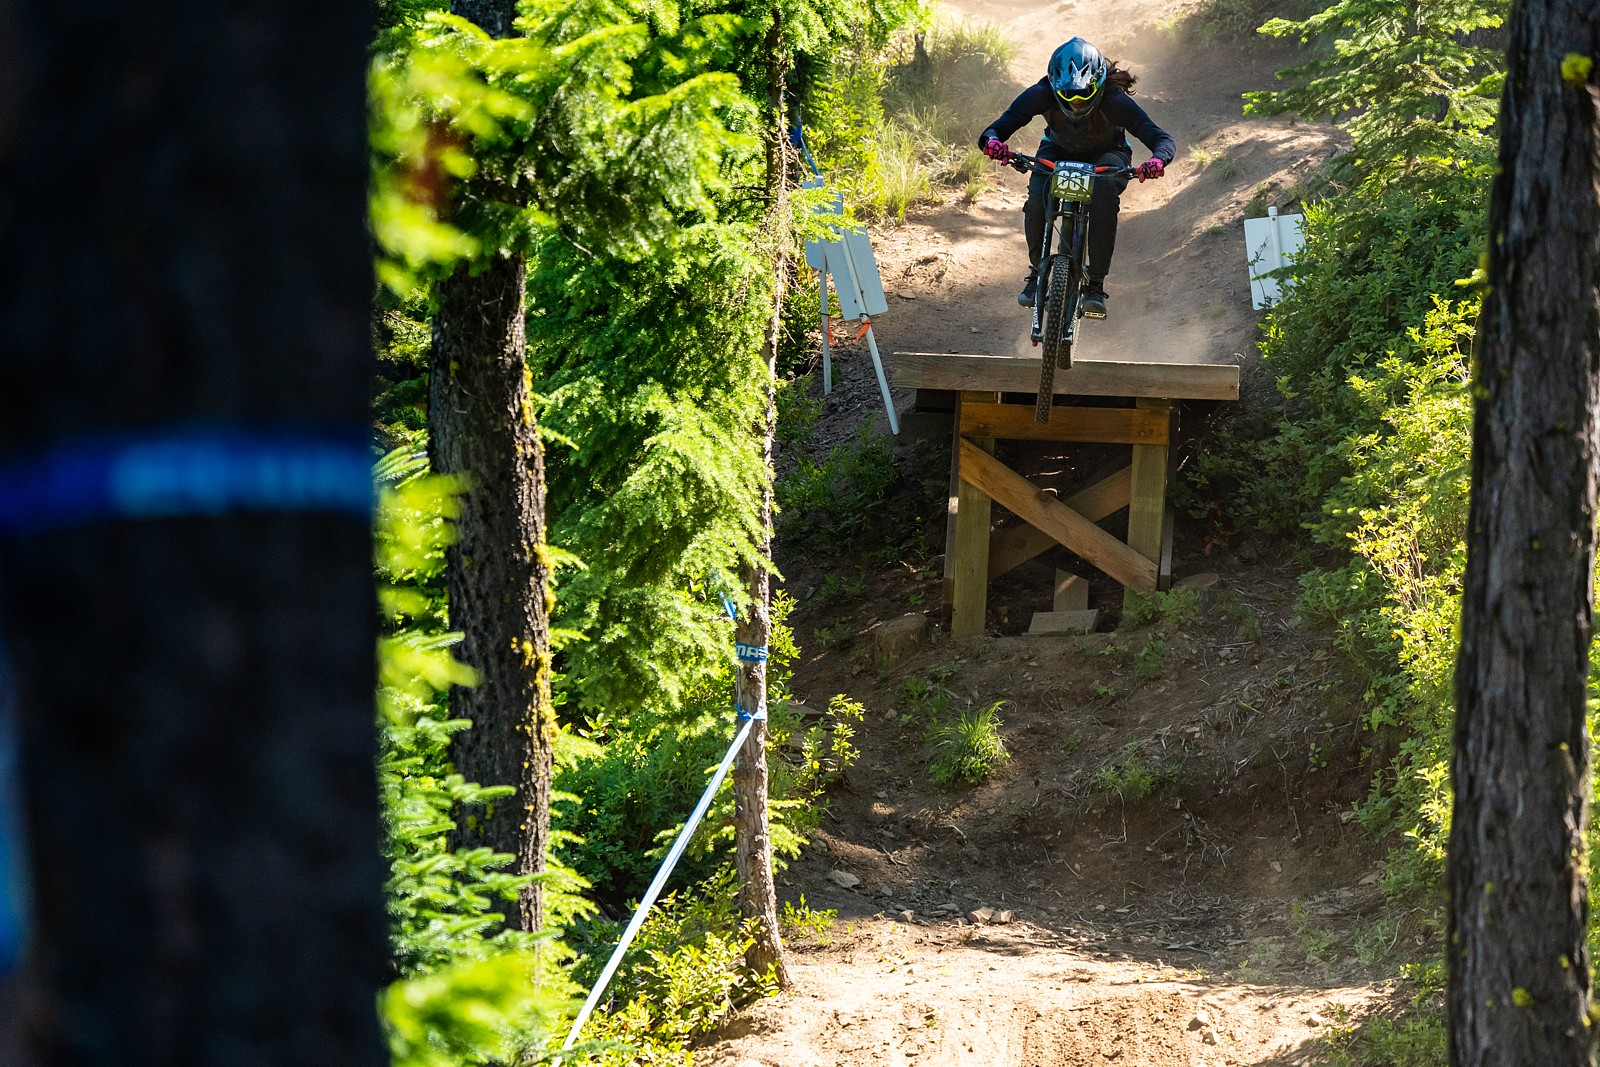 Kathryn Dove 3rd cat 2 19-39 - Zuestman - Mountain Biking Pictures - Vital MTB